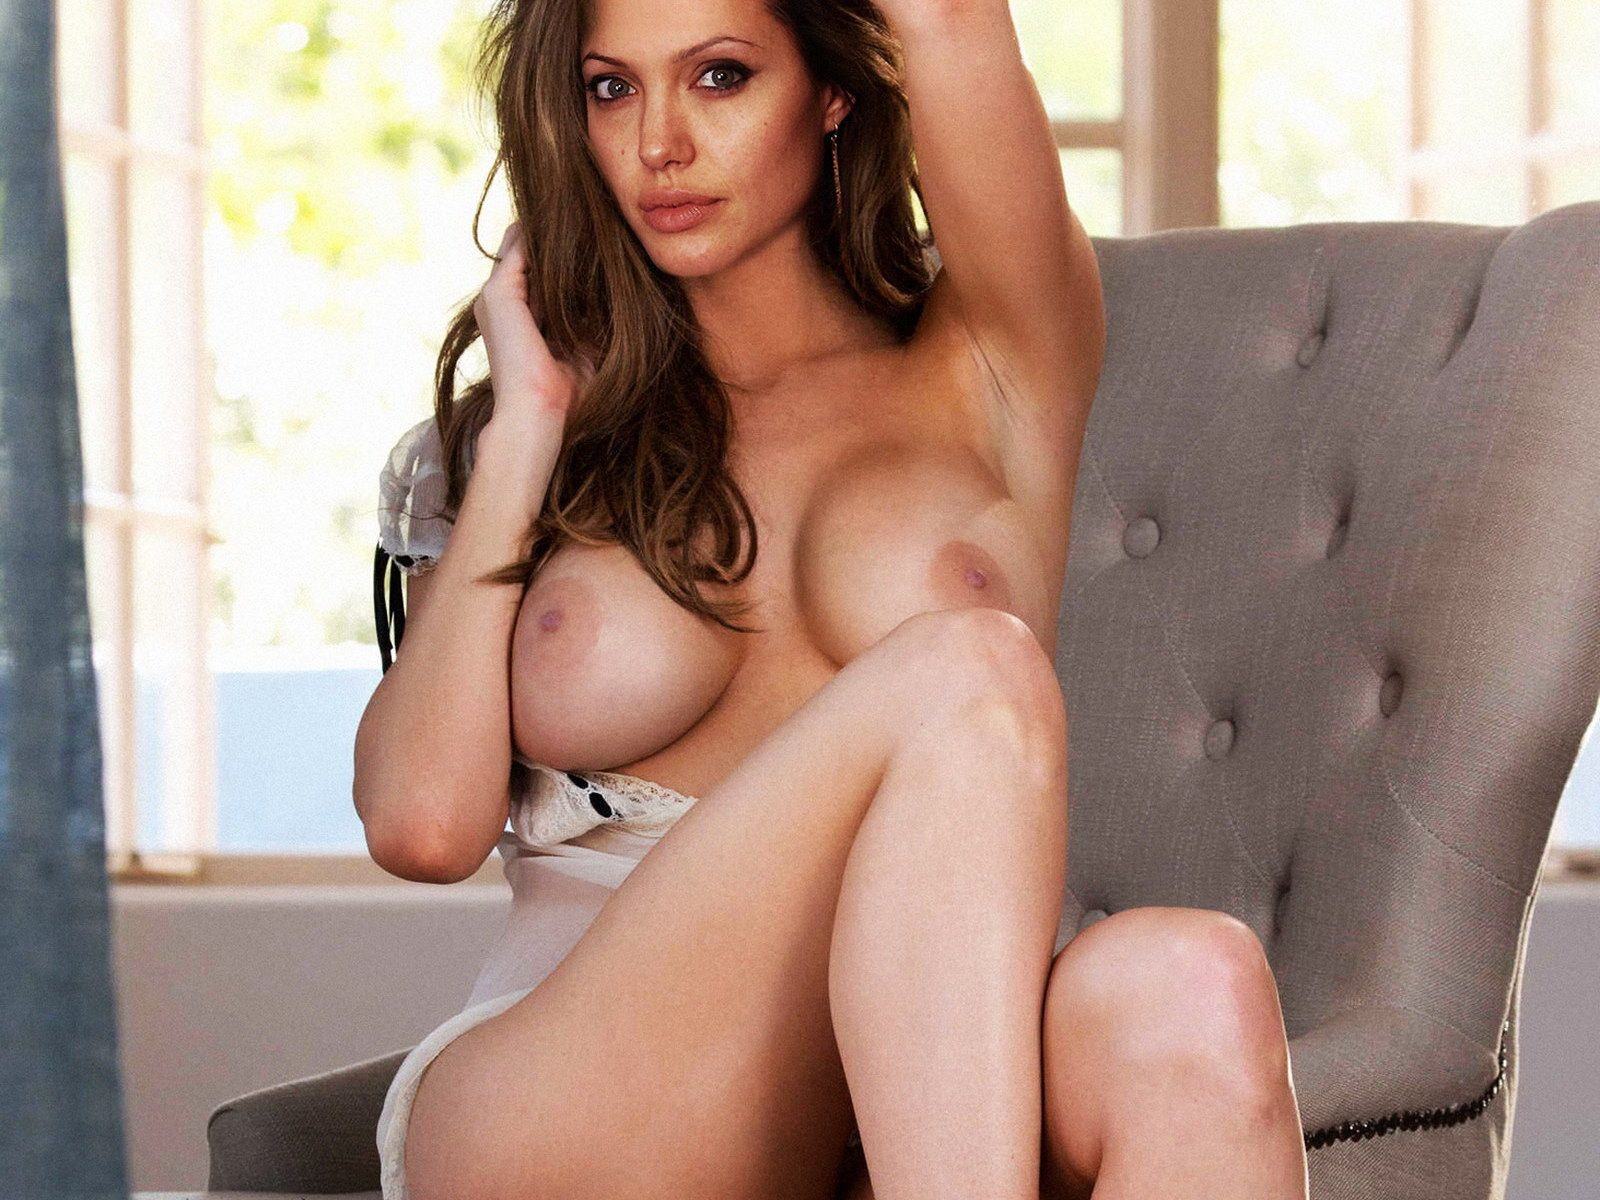 Not angelina jolie nude photoshoot